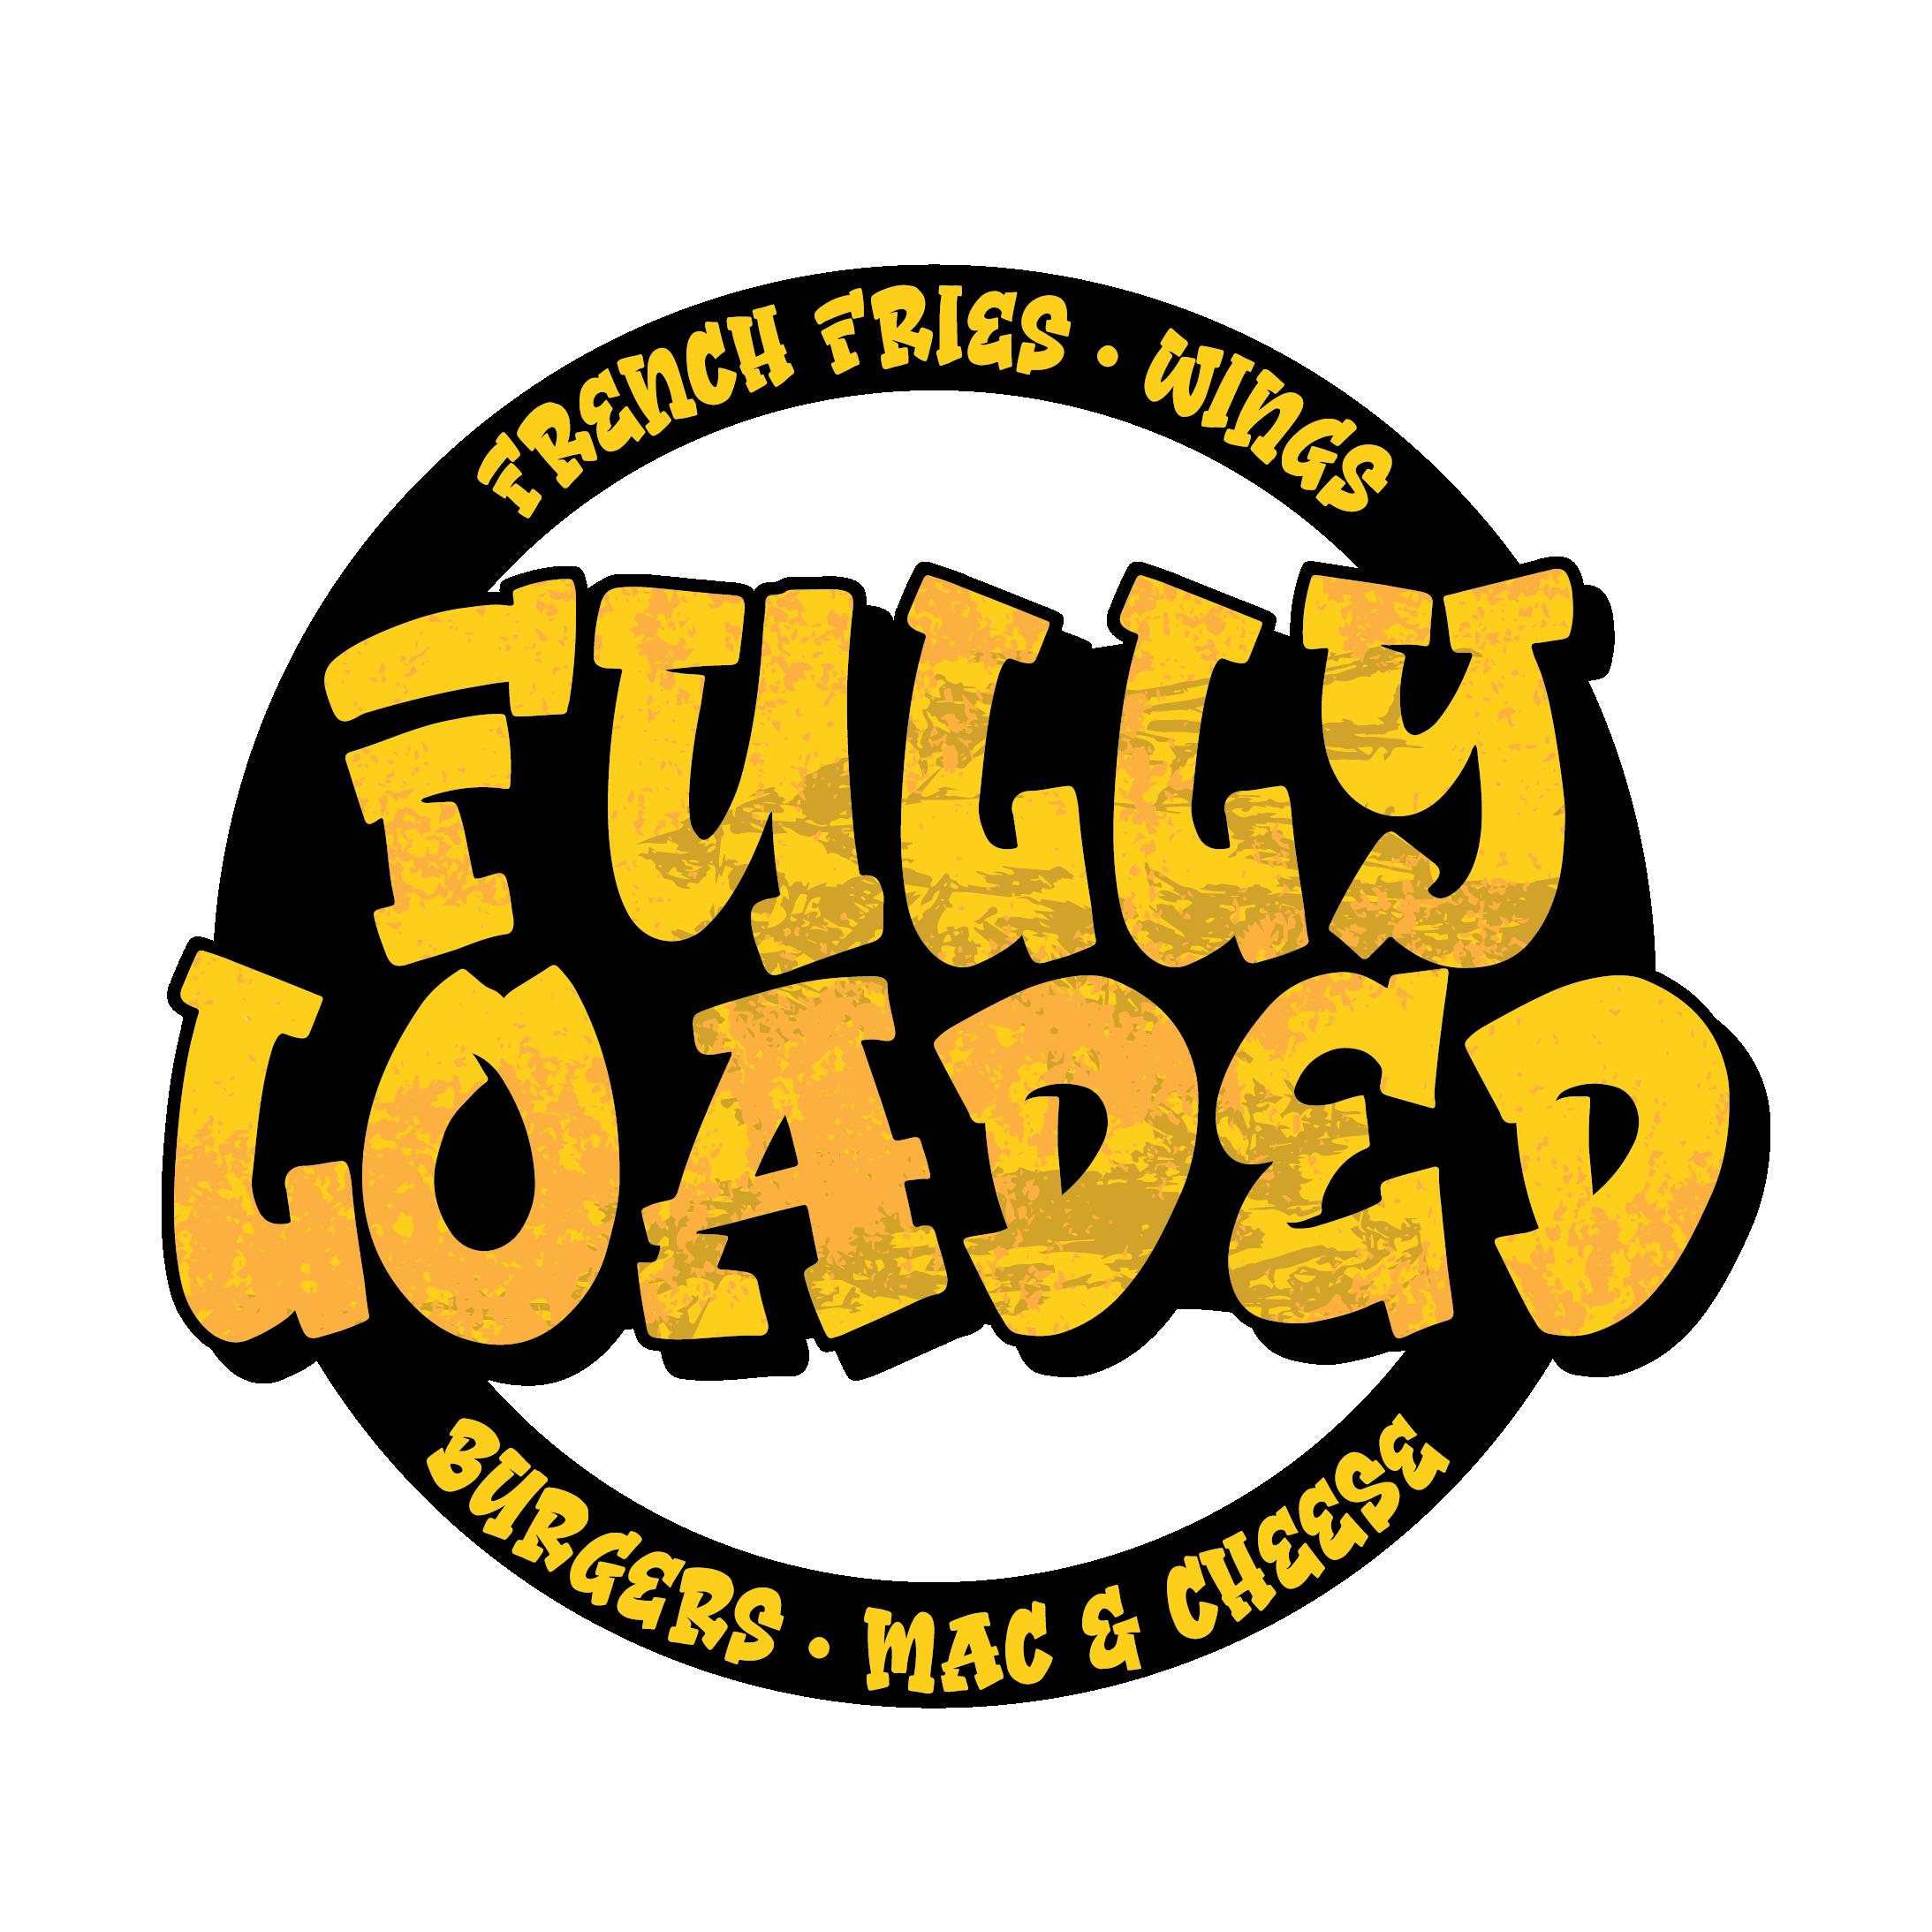 Website design and branding for fully loaded